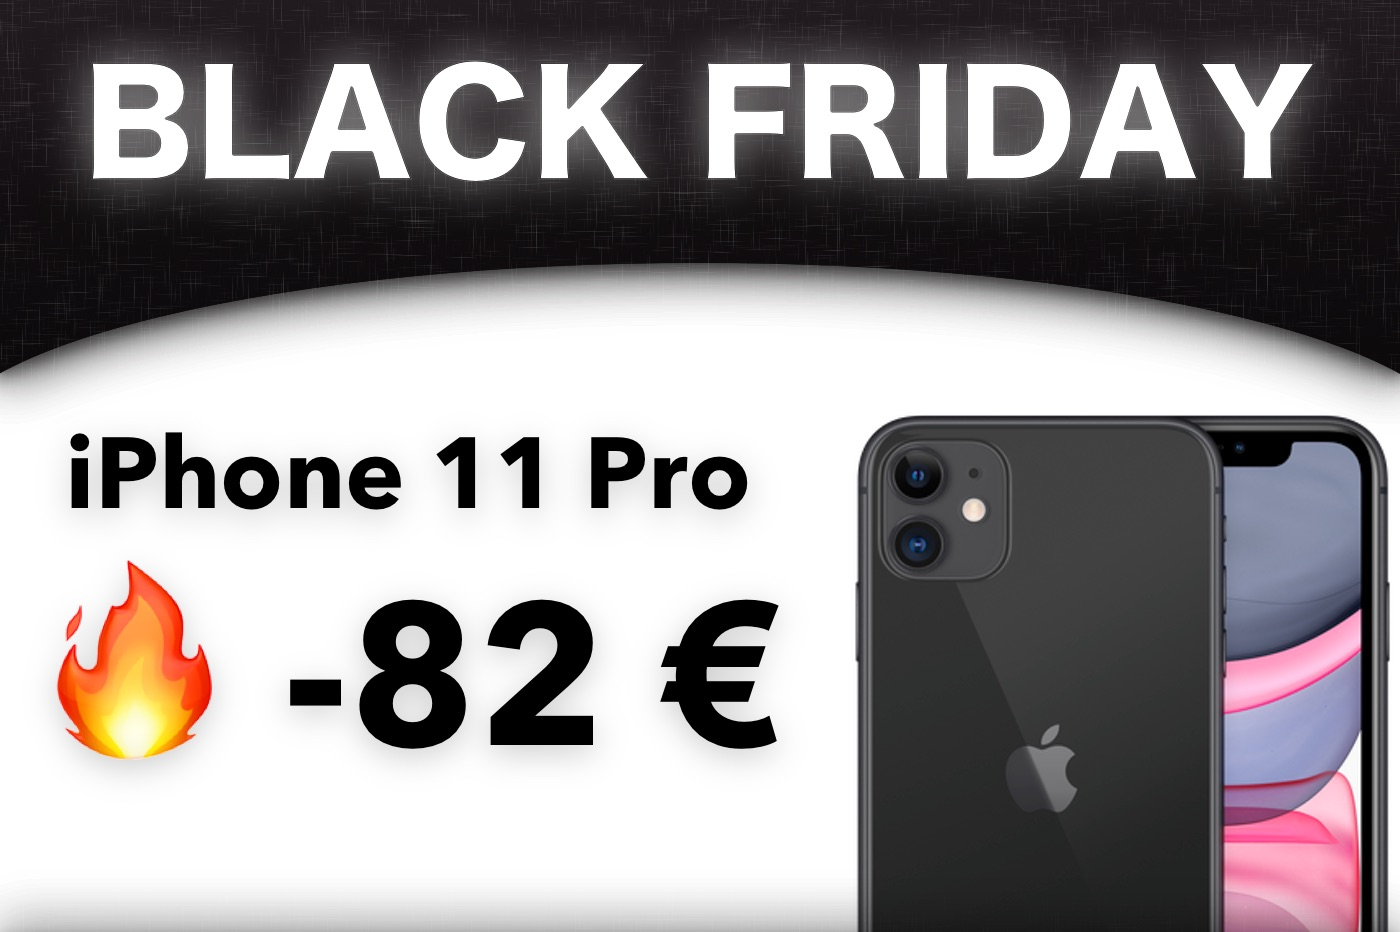 Black Friday Apple iPhone 11 Pro